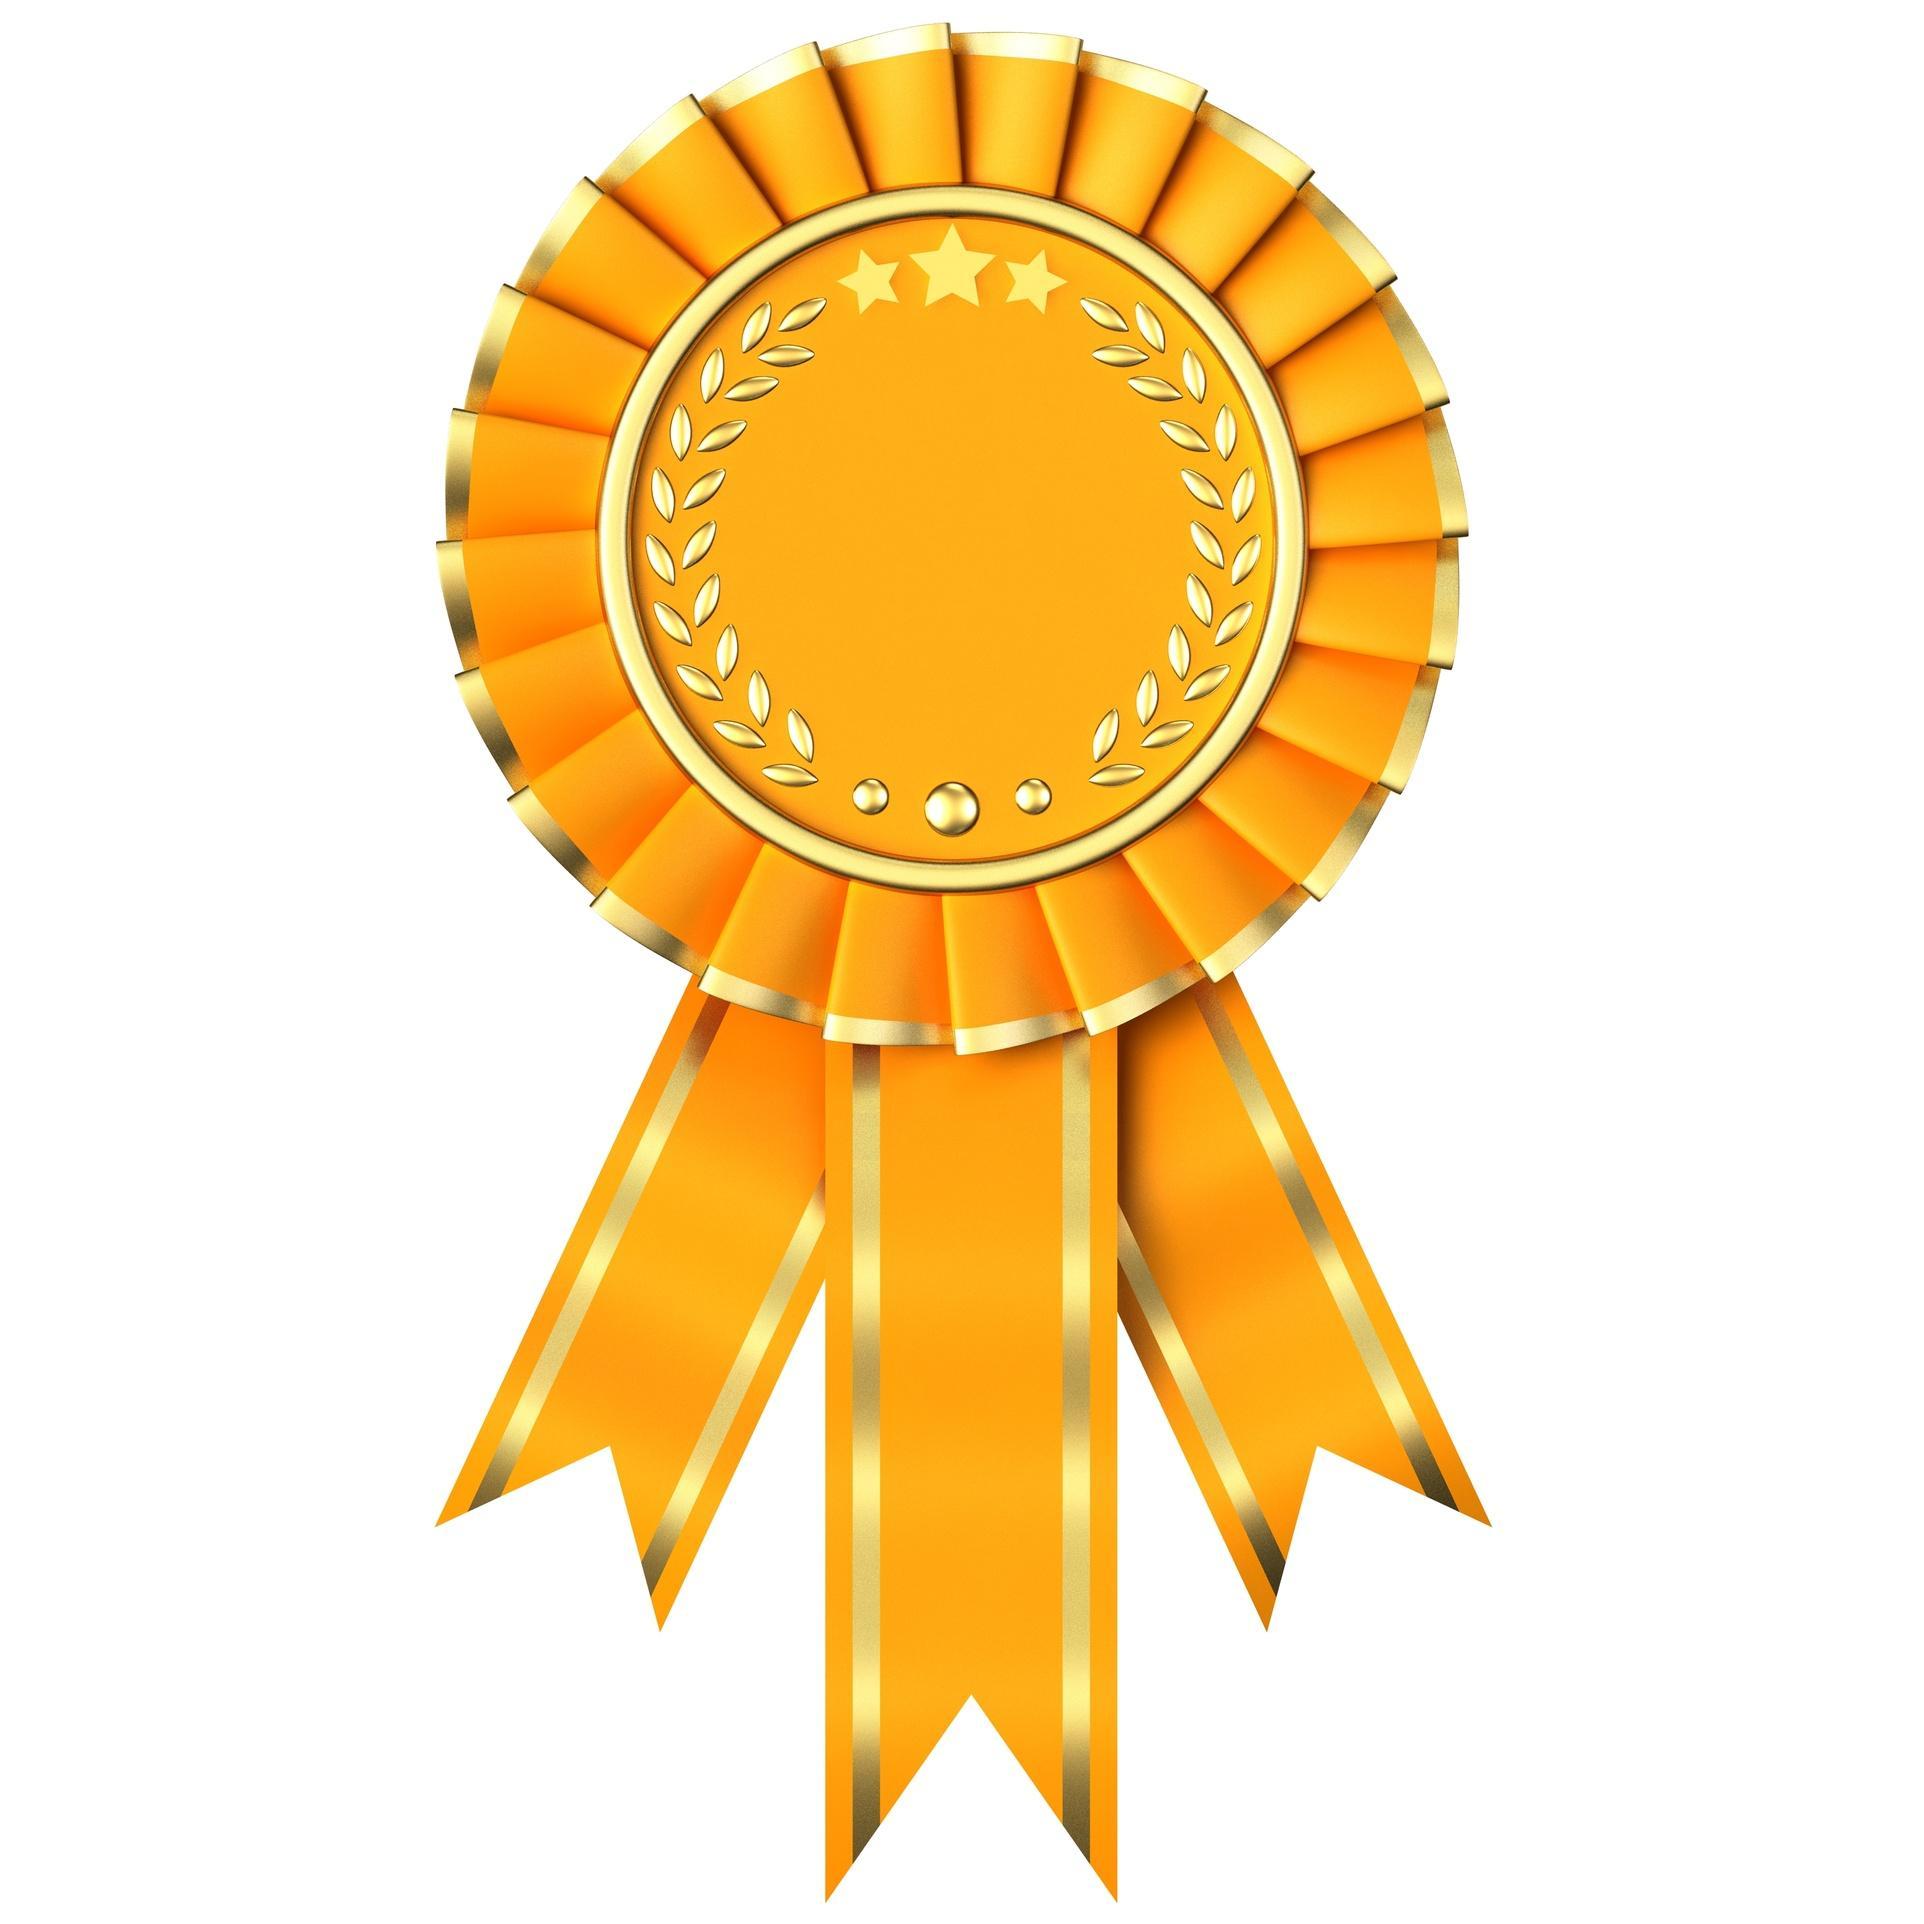 Award Ribbon Png award trophy transparent clipart - clipart kid